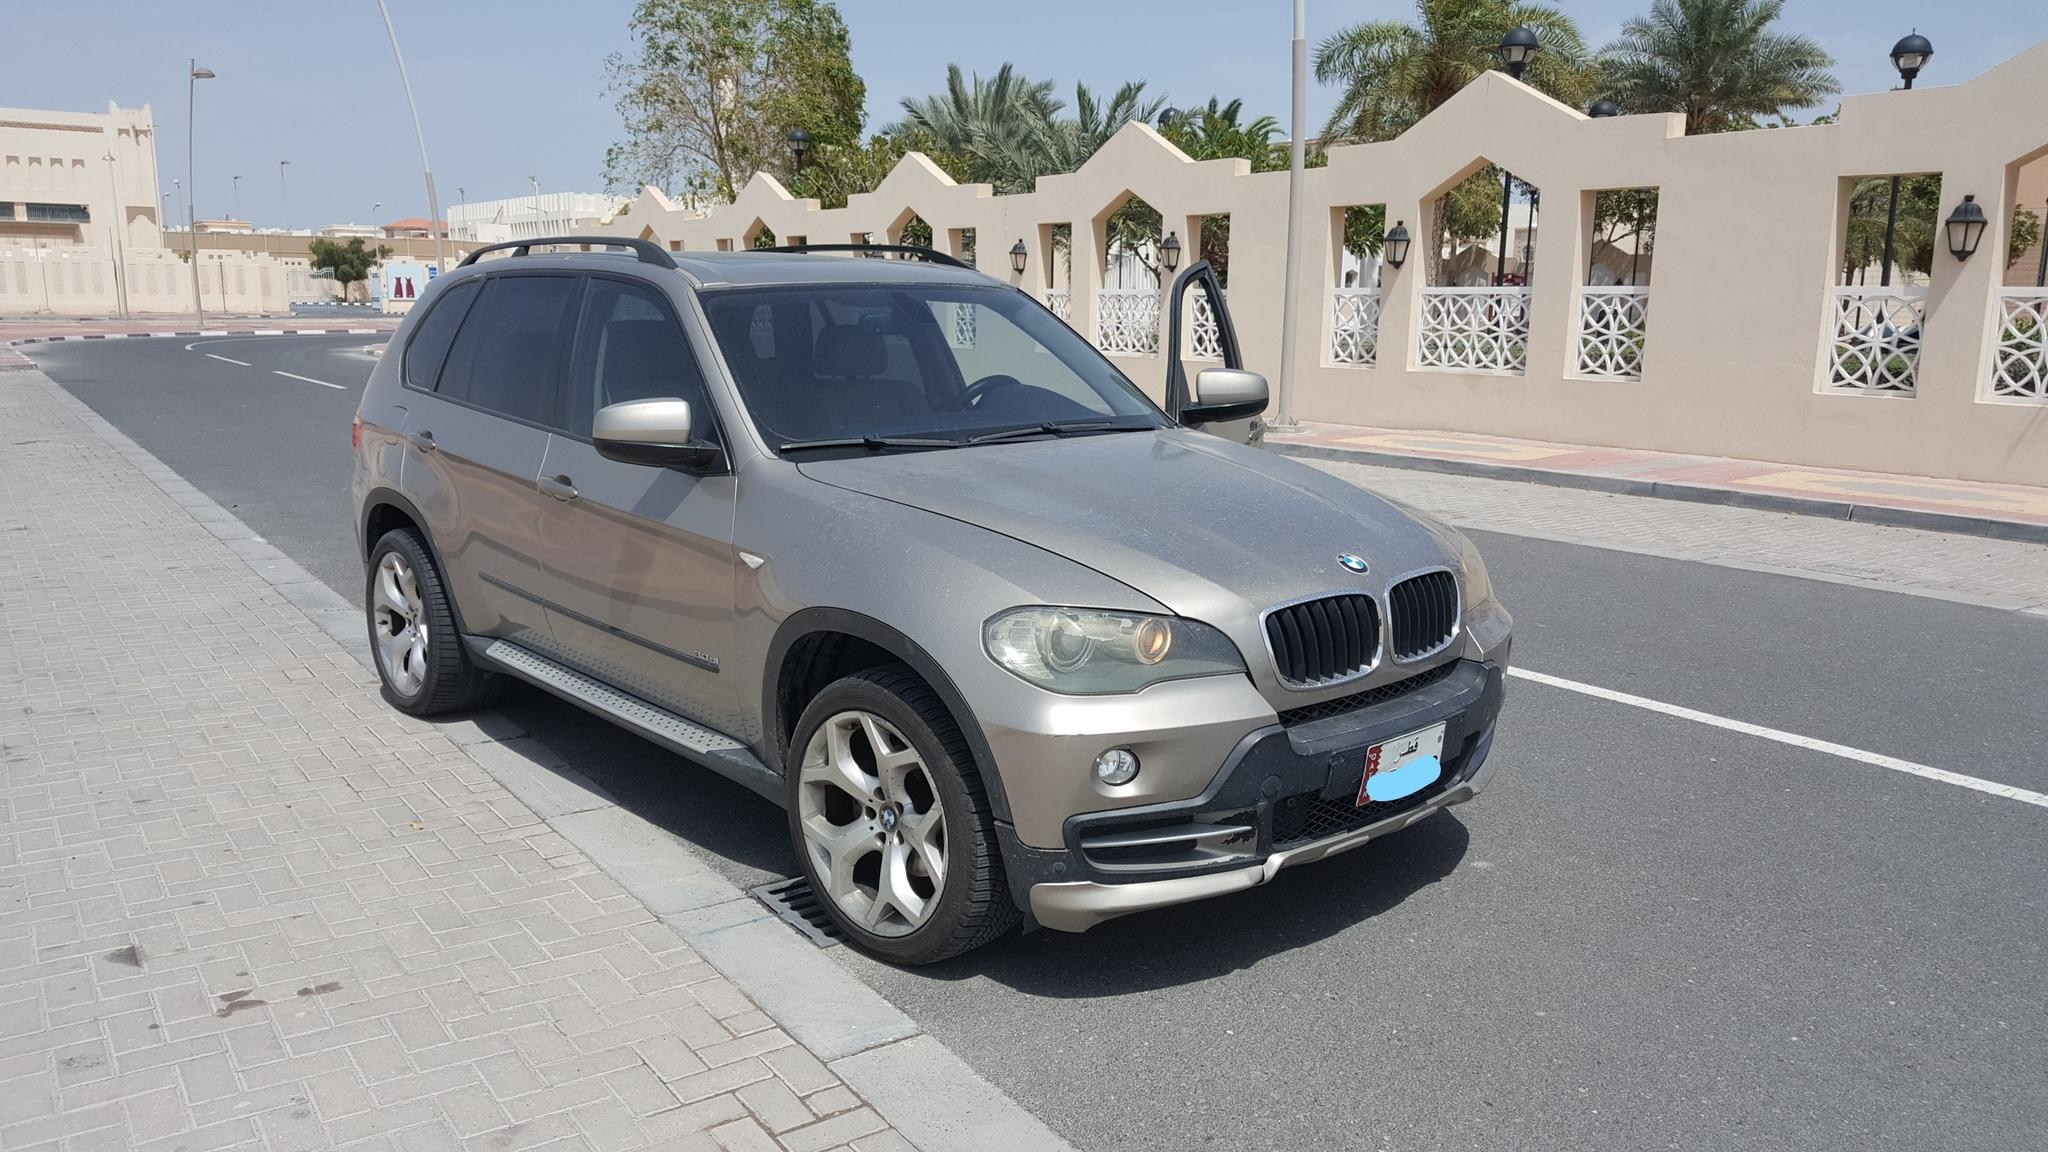 BMW X5 3.0Si - Oldie but goodie!   Qatar Living